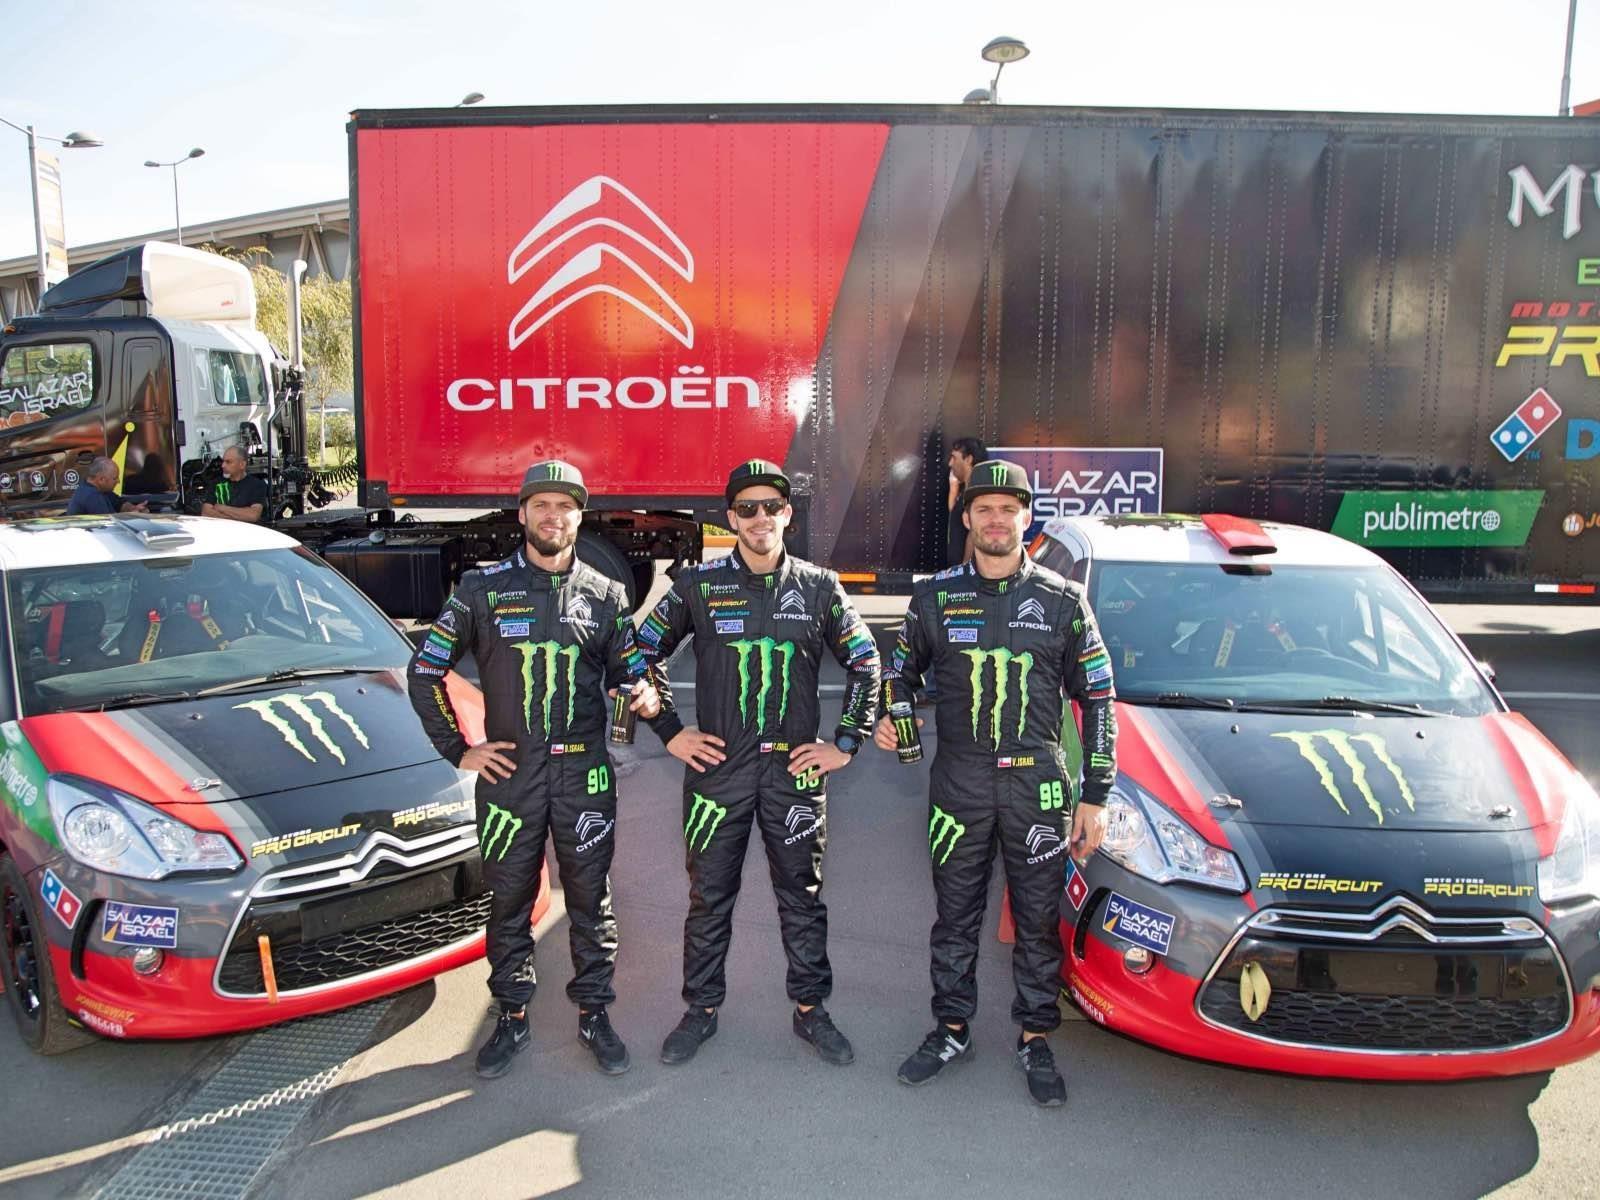 Citroën ingresa al Rally Mobil con equipo oficial